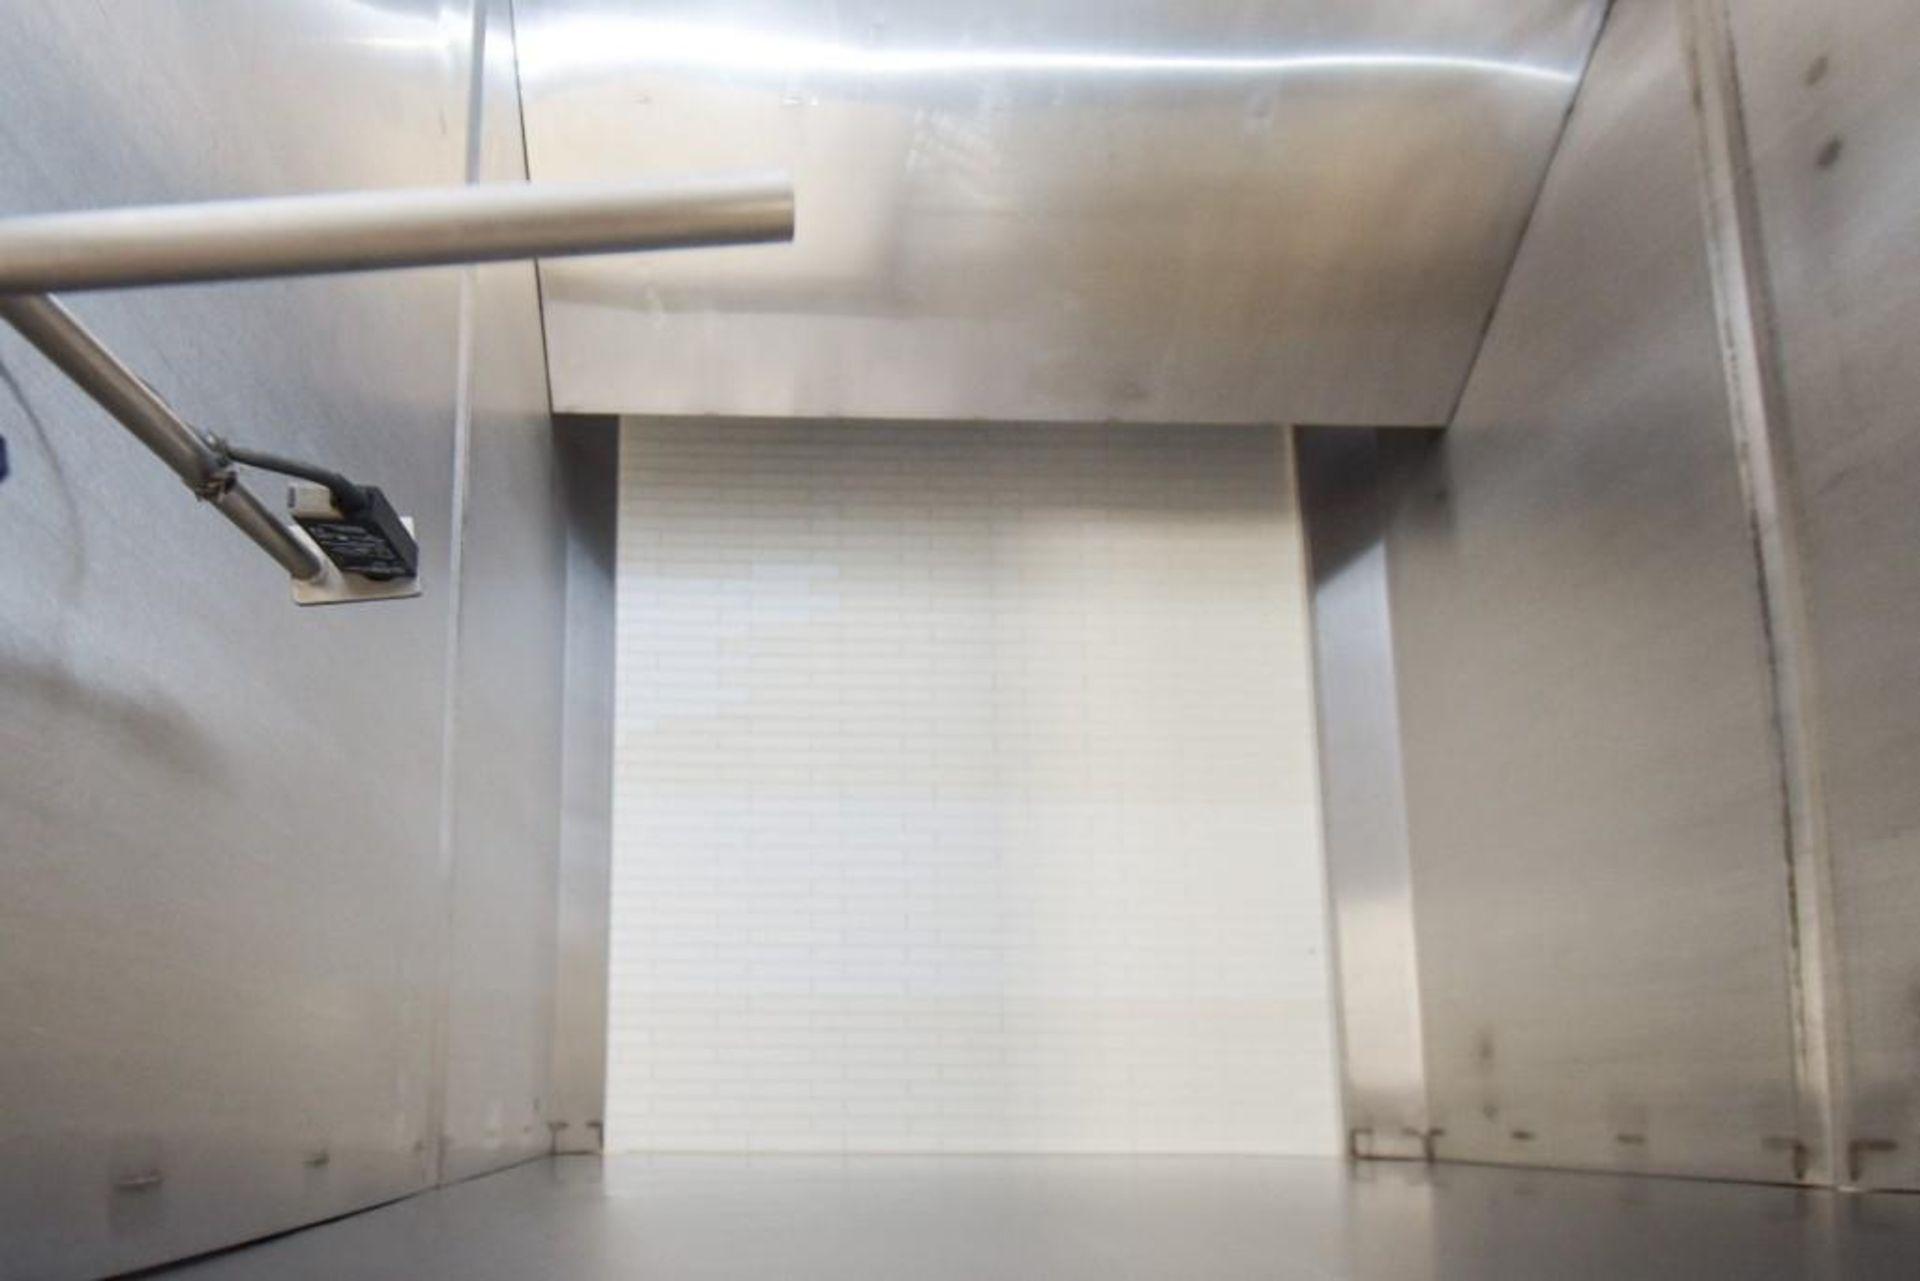 RBM Accumulation Hopper Conveyor and Vibratory Deck AC-1-4X4-6 - Image 7 of 11